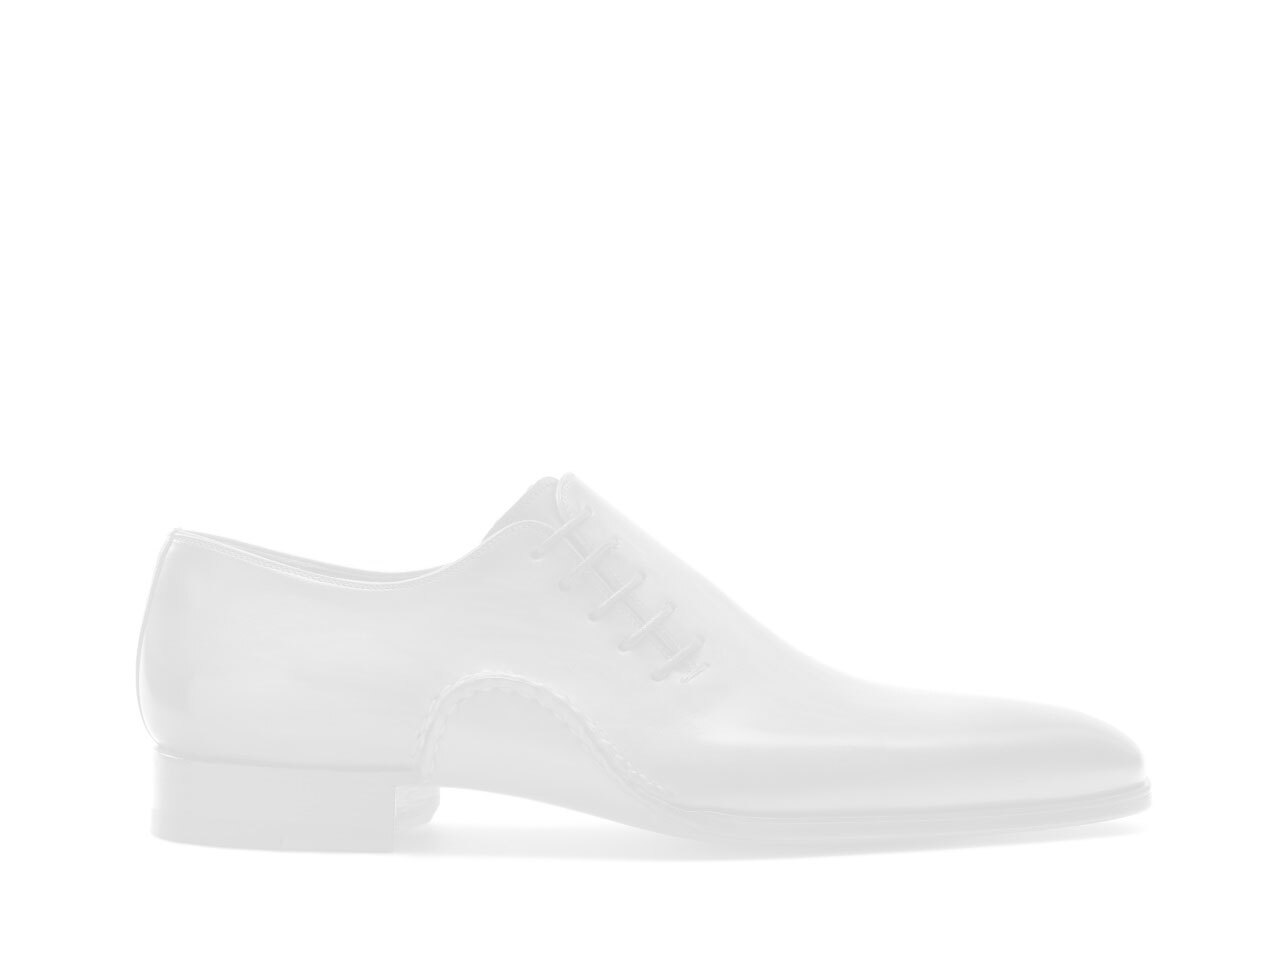 Pair of the Magnanni Berceo Burgundy Men's Sneakers